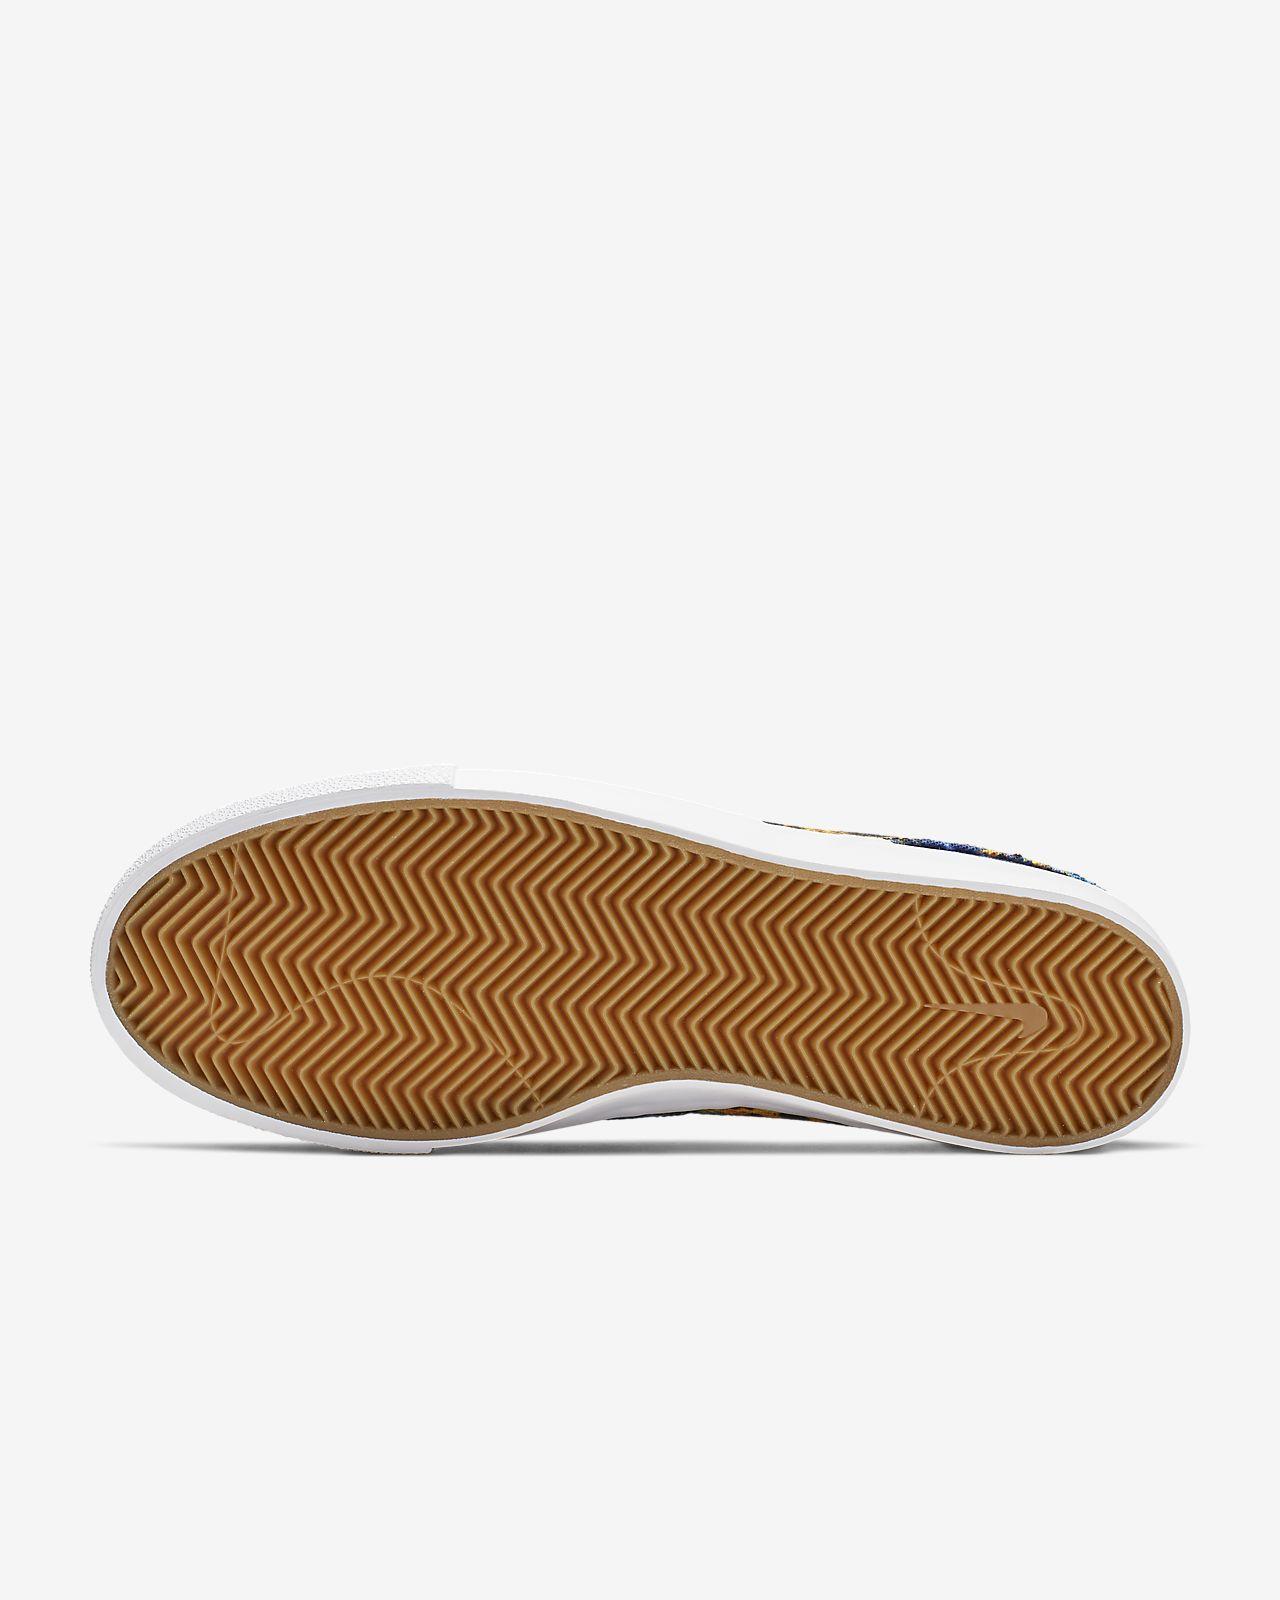 cheap for sale new appearance amazing selection Nike SB Zoom Stefan Janoski Slip Canvas RM Premium Skate Shoe